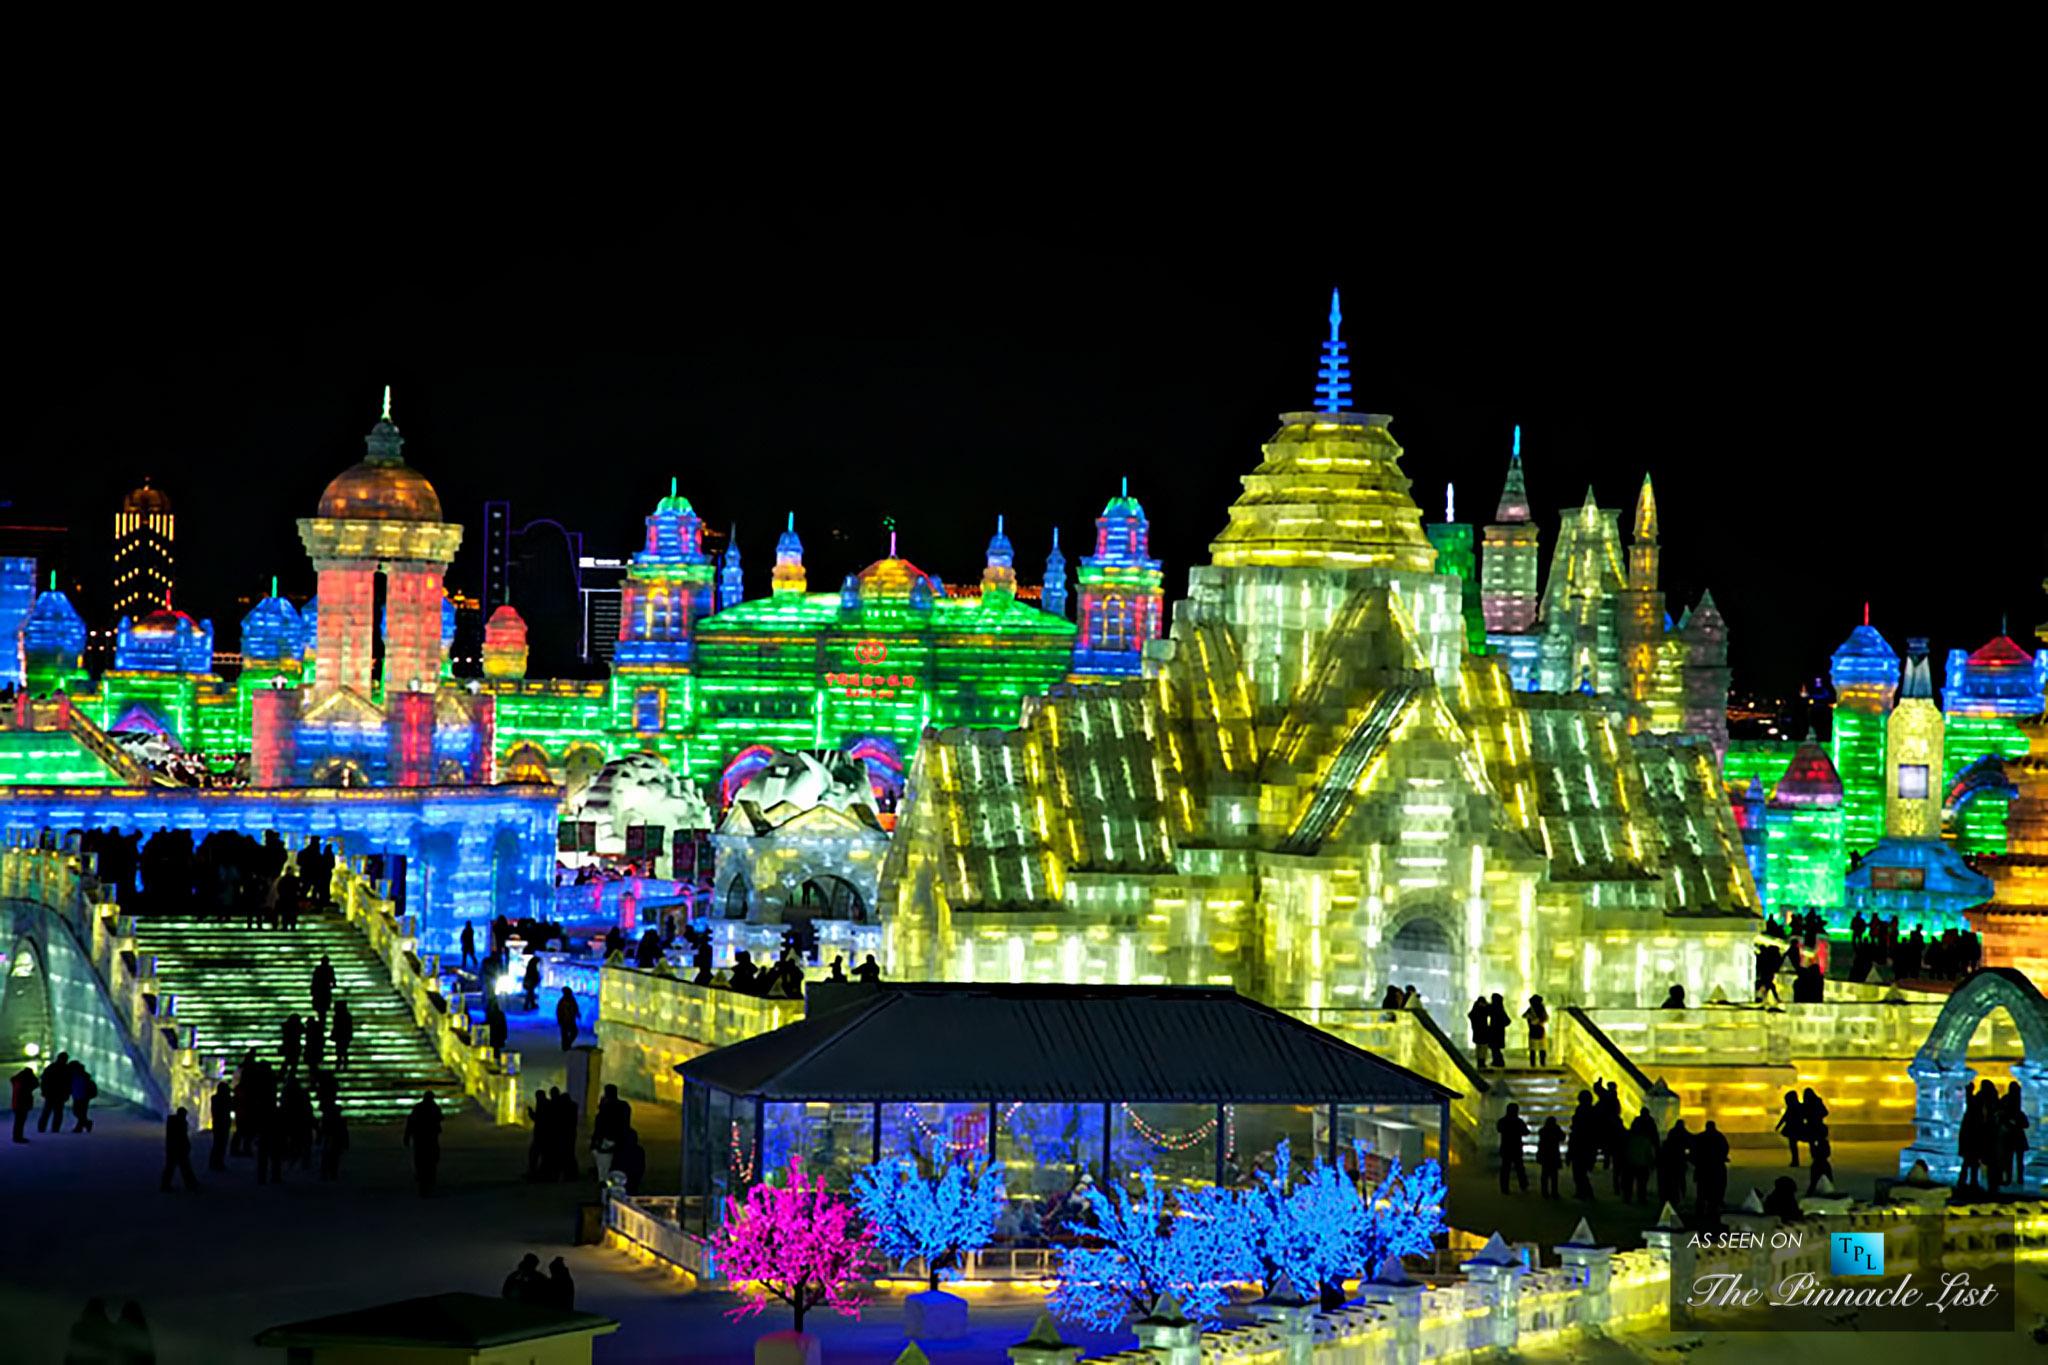 Harbin International Snow and Ice Festival - An Illuminated Awe-Inspiring Winter Wonderland in China